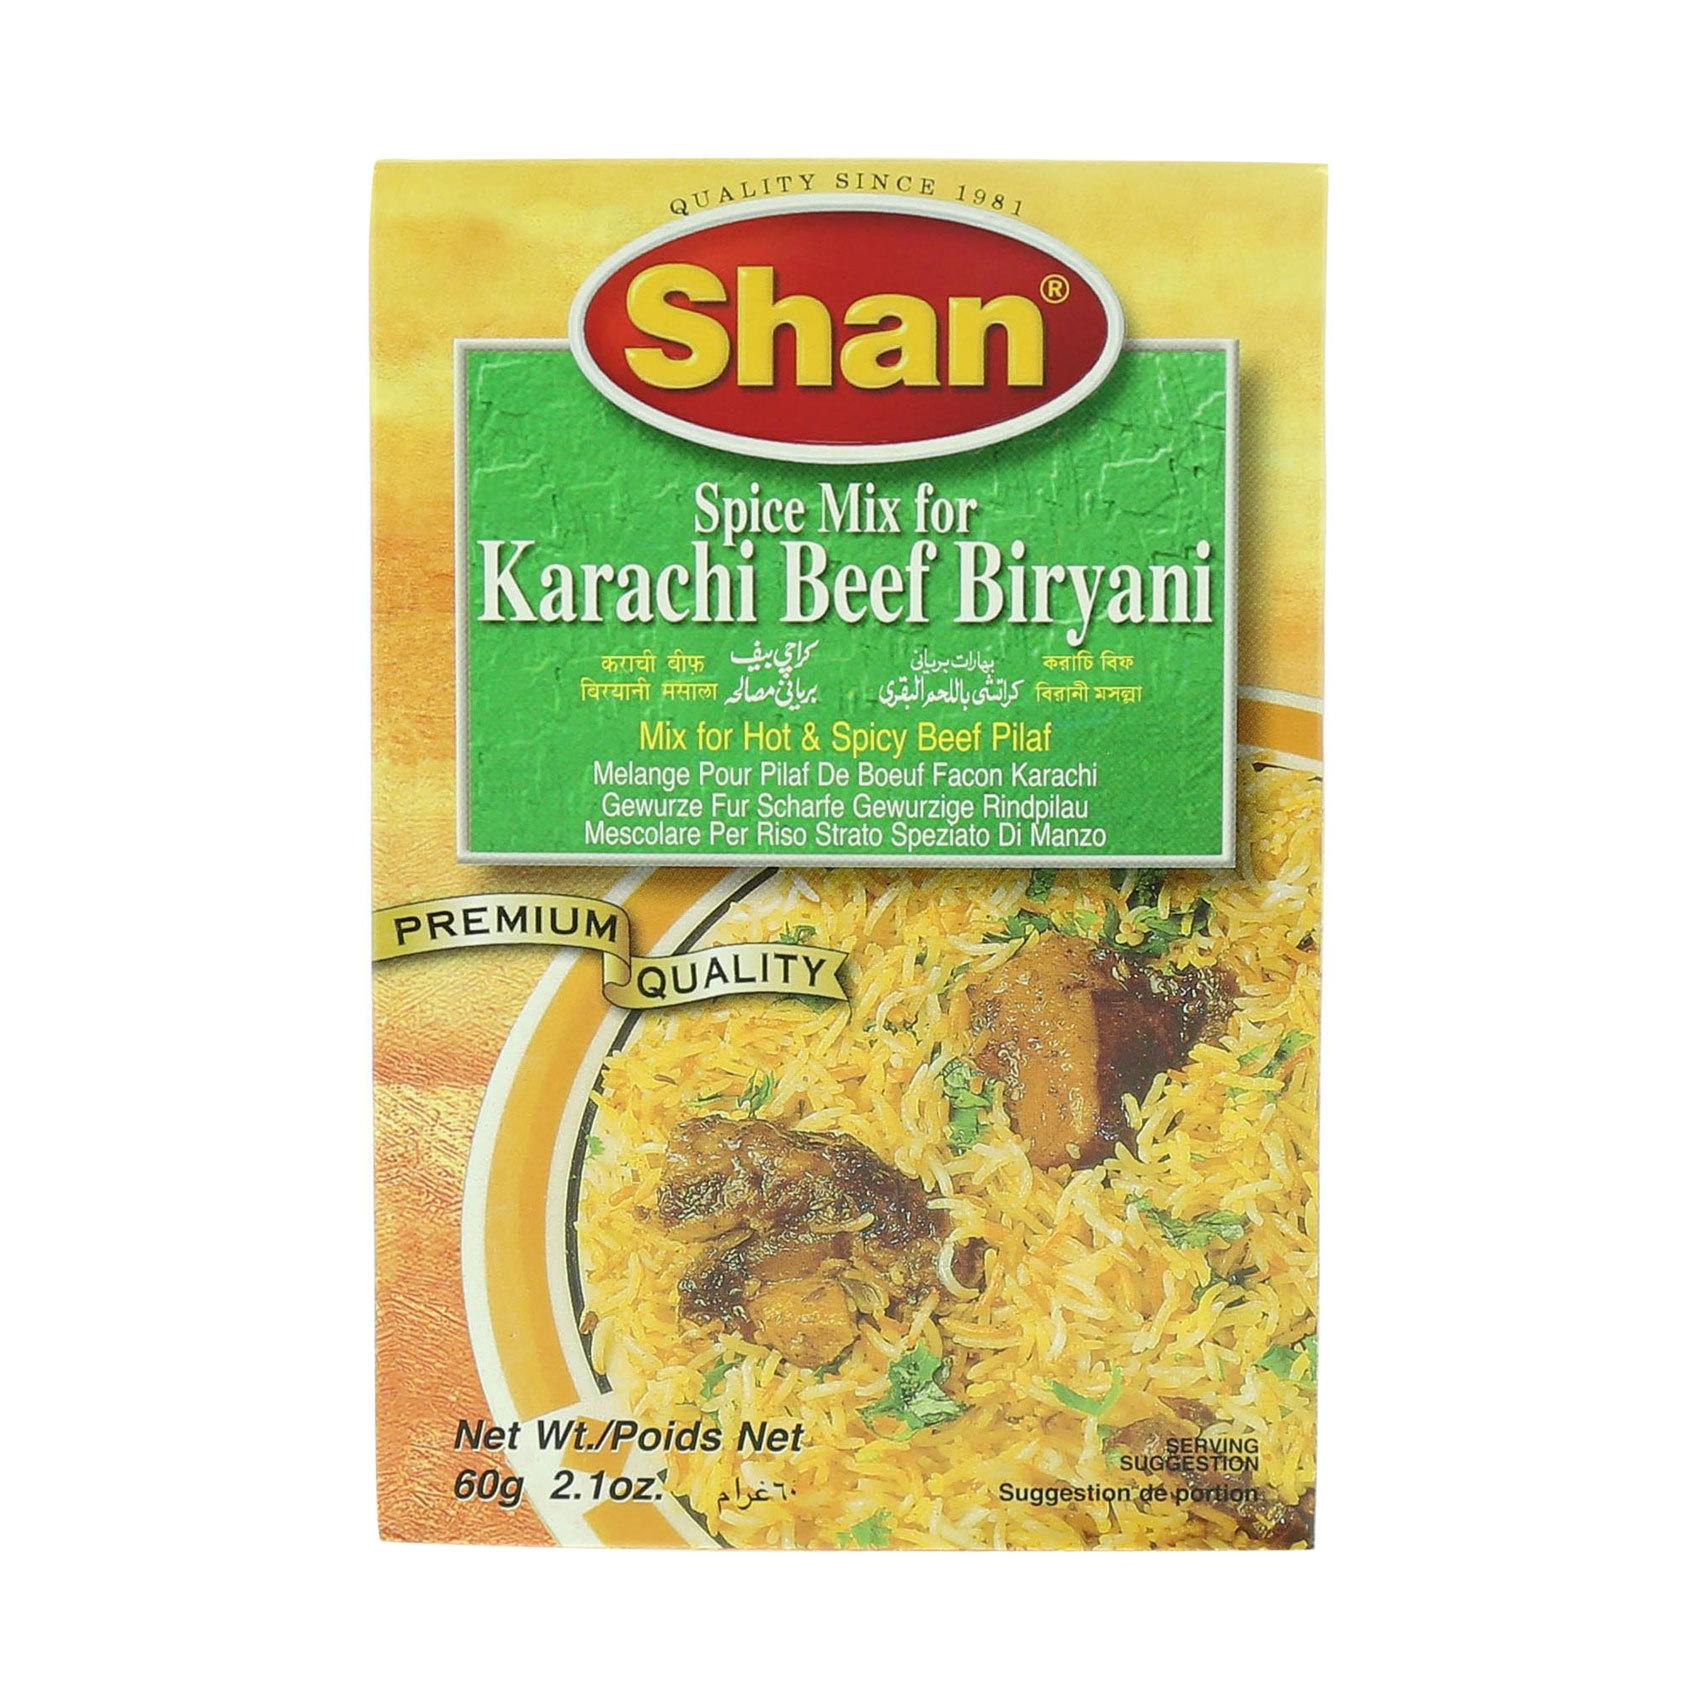 SHAN KARACHI BEEF BIRYANI MIX 75G